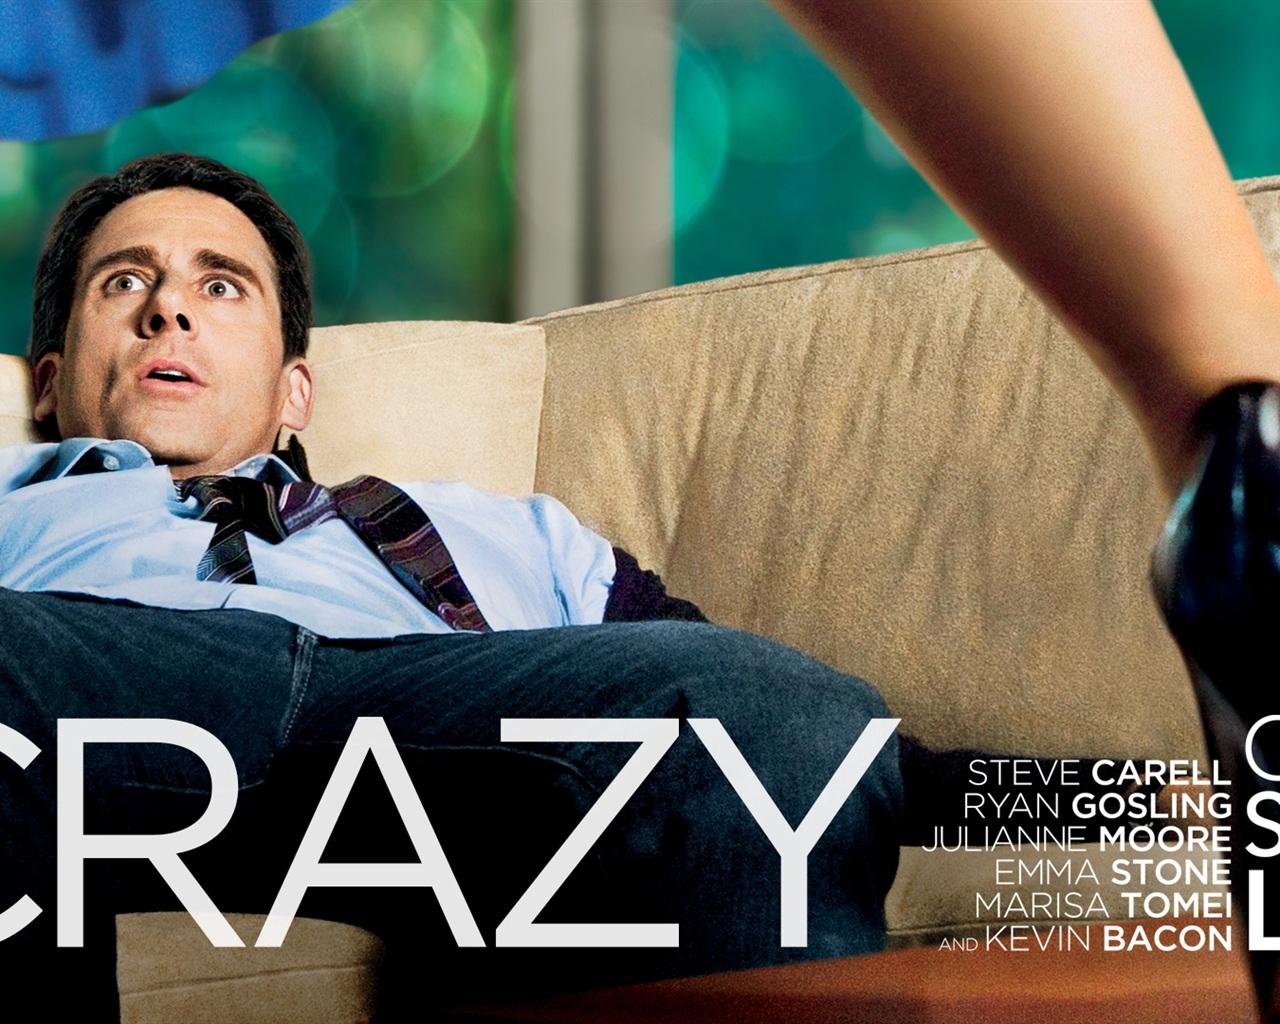 Crazy stupid love fondos de pantalla 1280x1024 descripción crazy